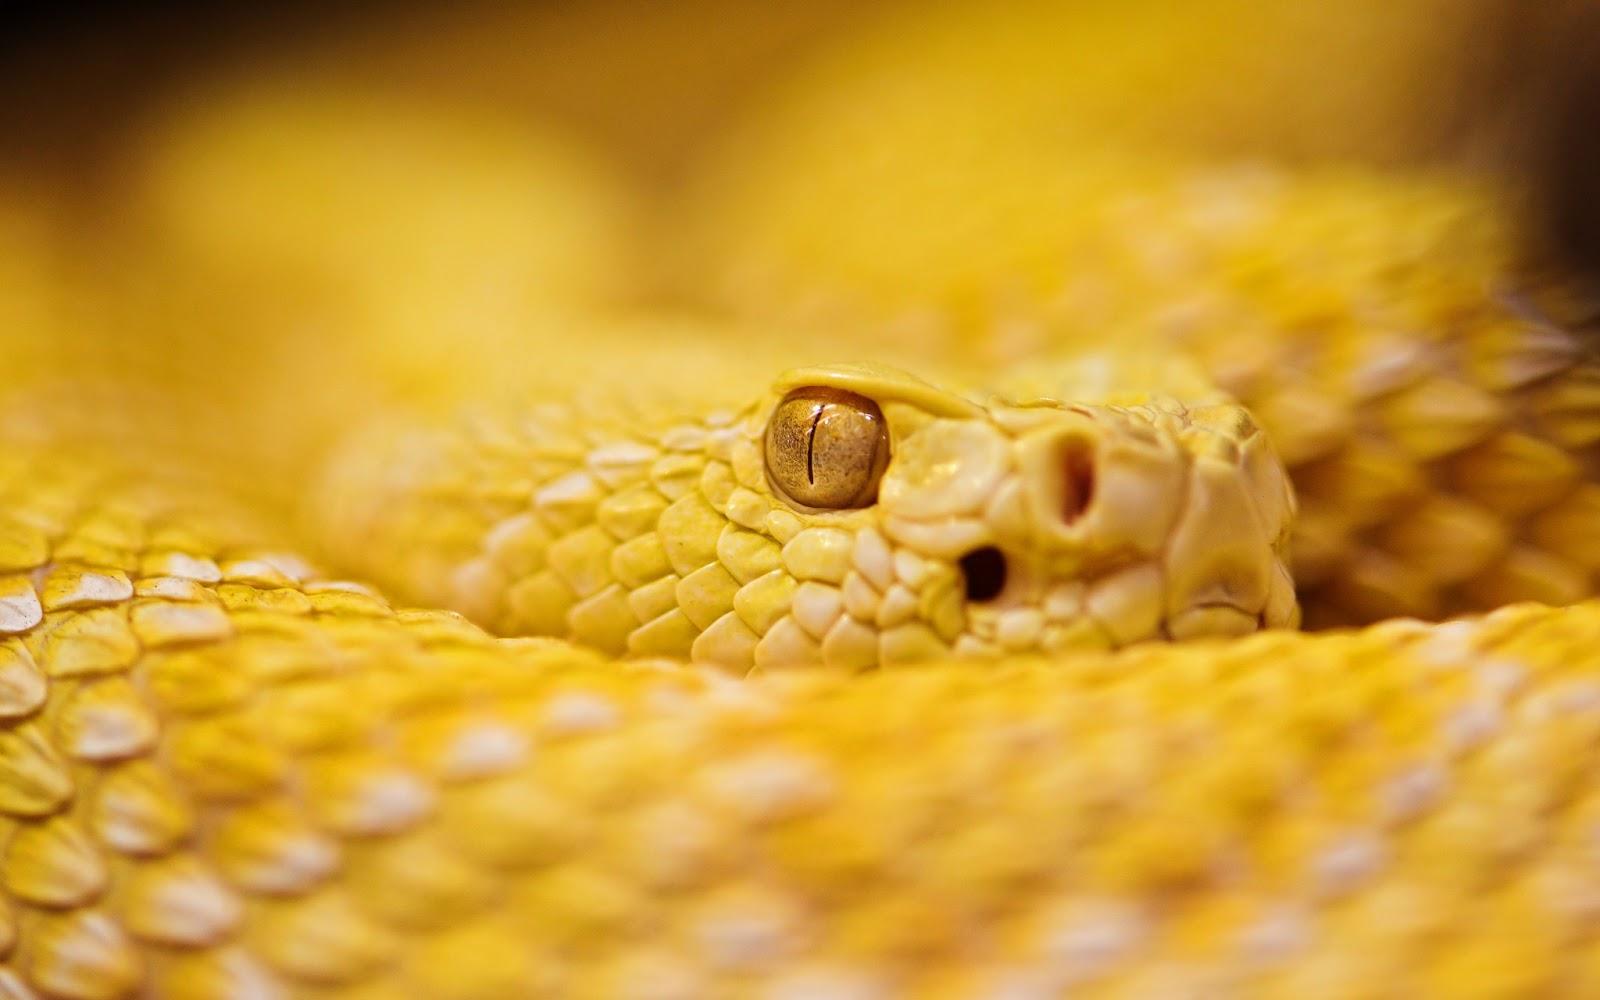 download yellow snake wallpaper